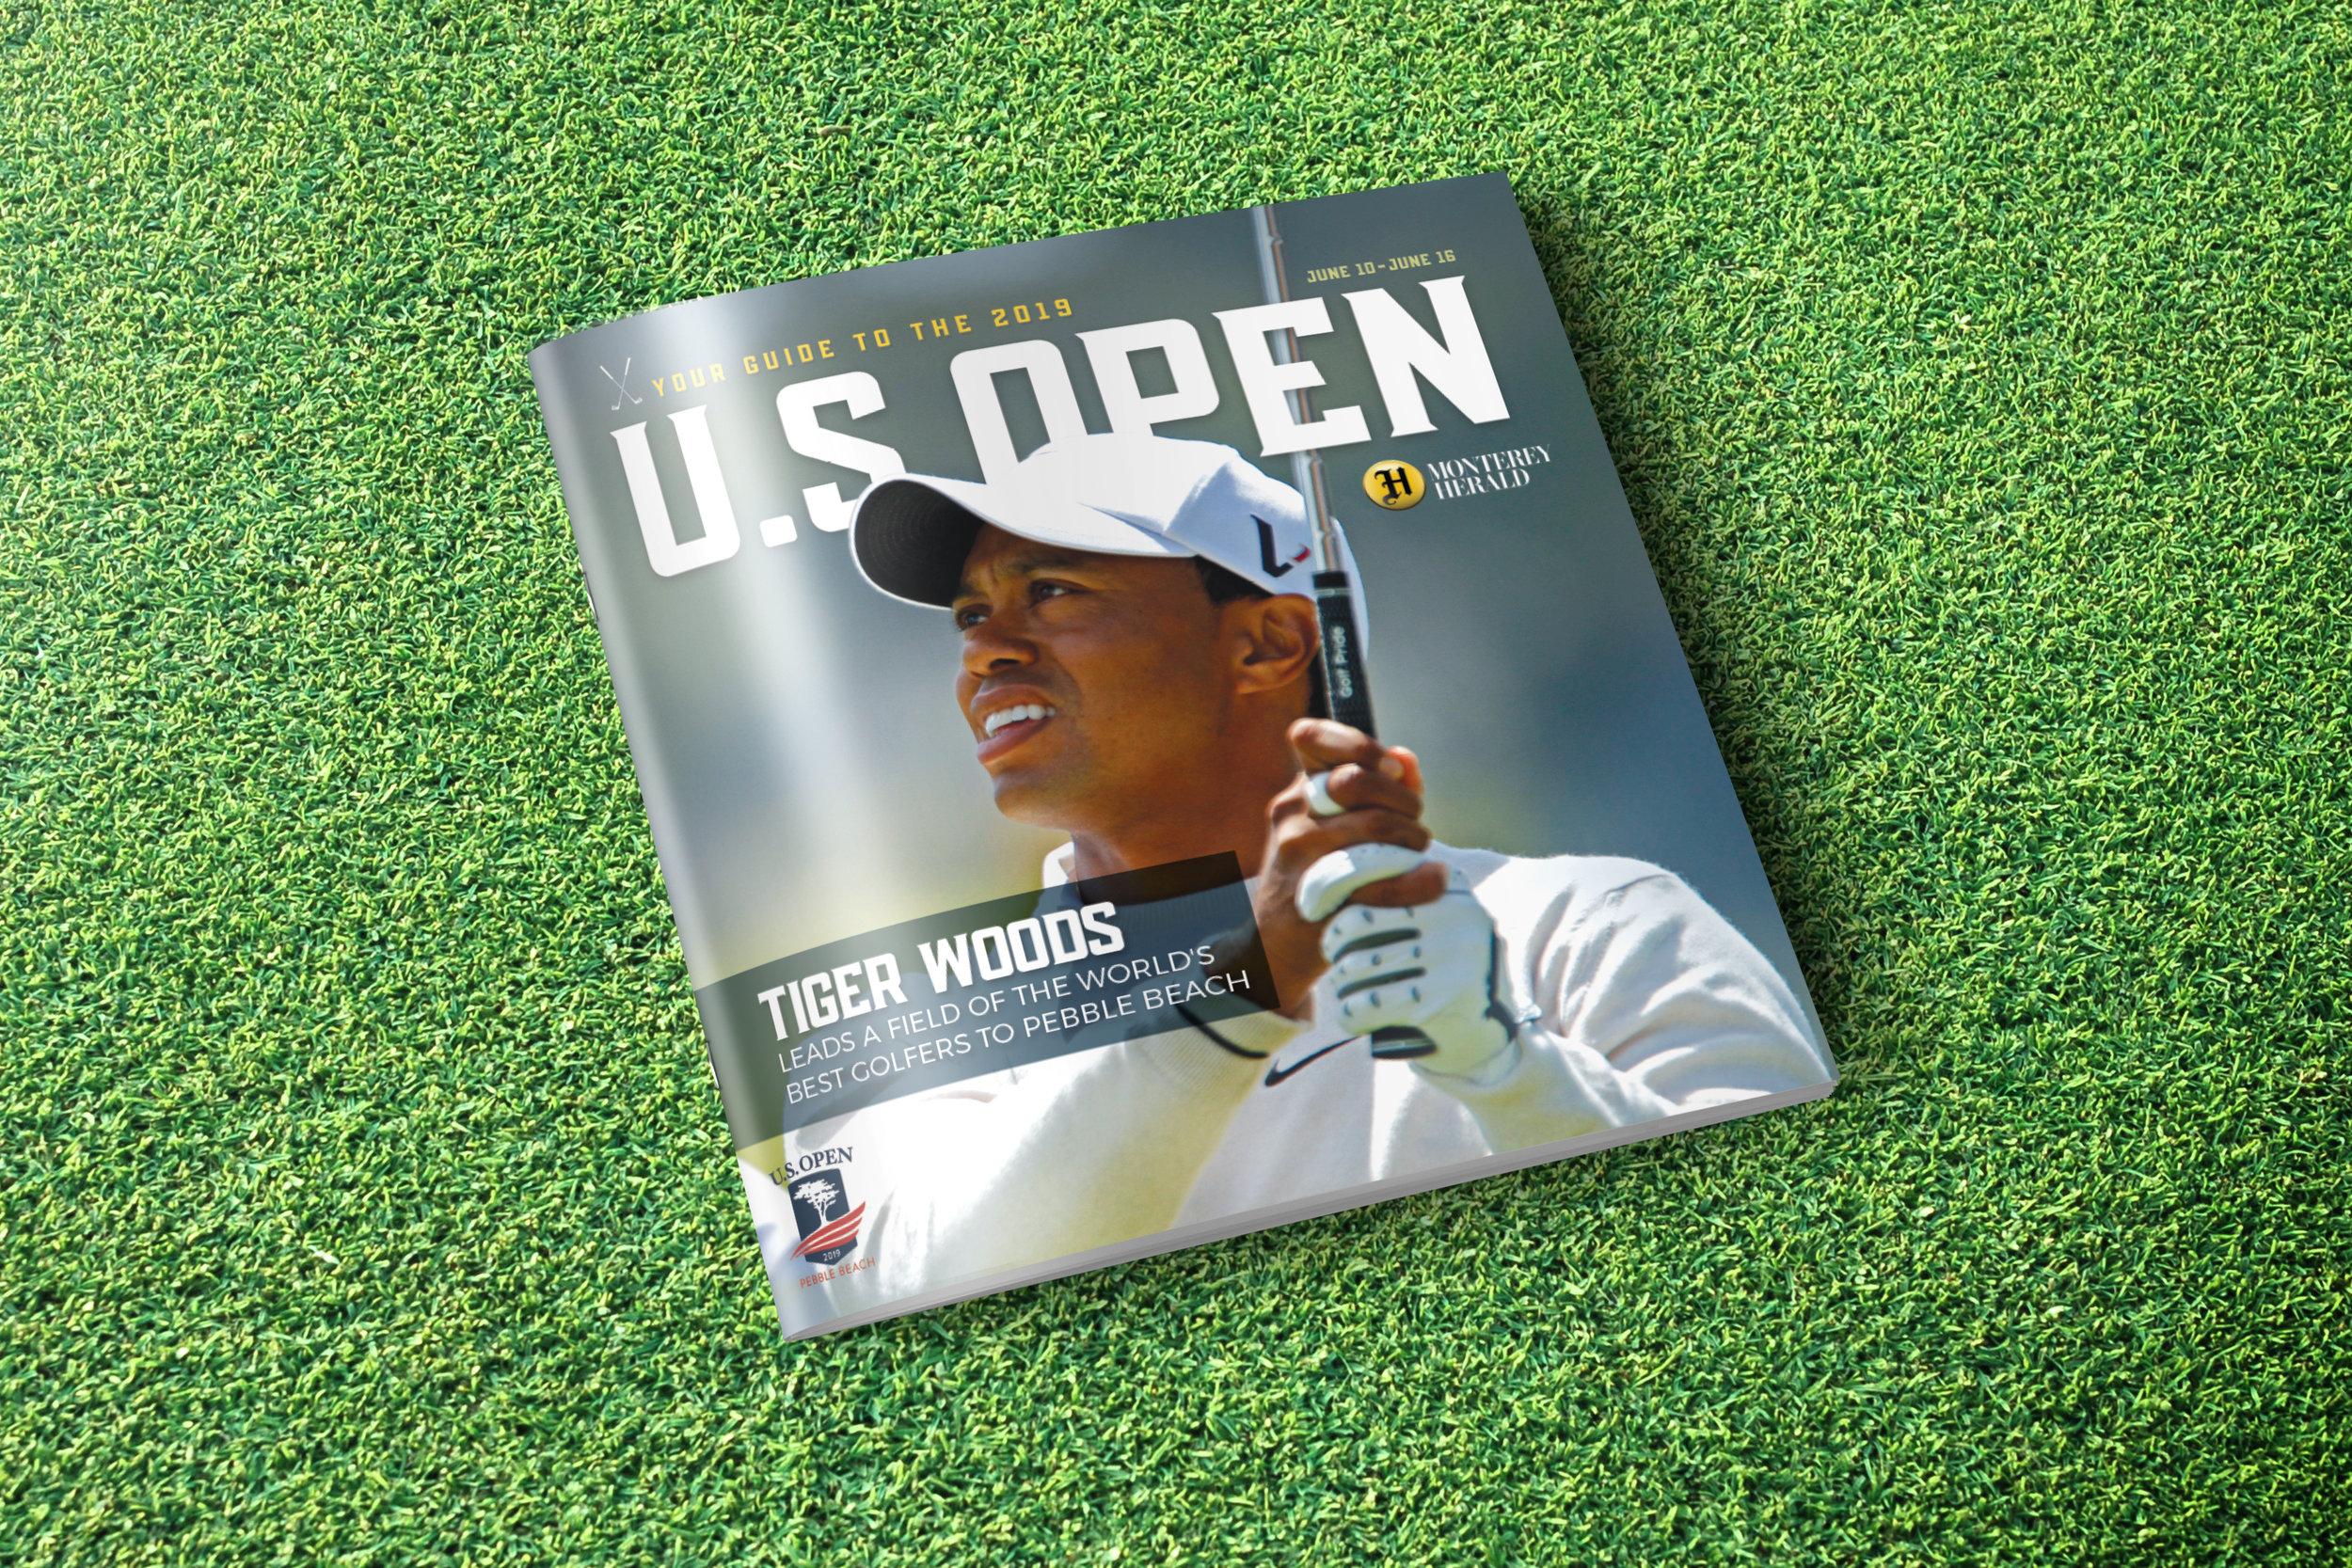 U.S. Open at Pebble Beach 2019